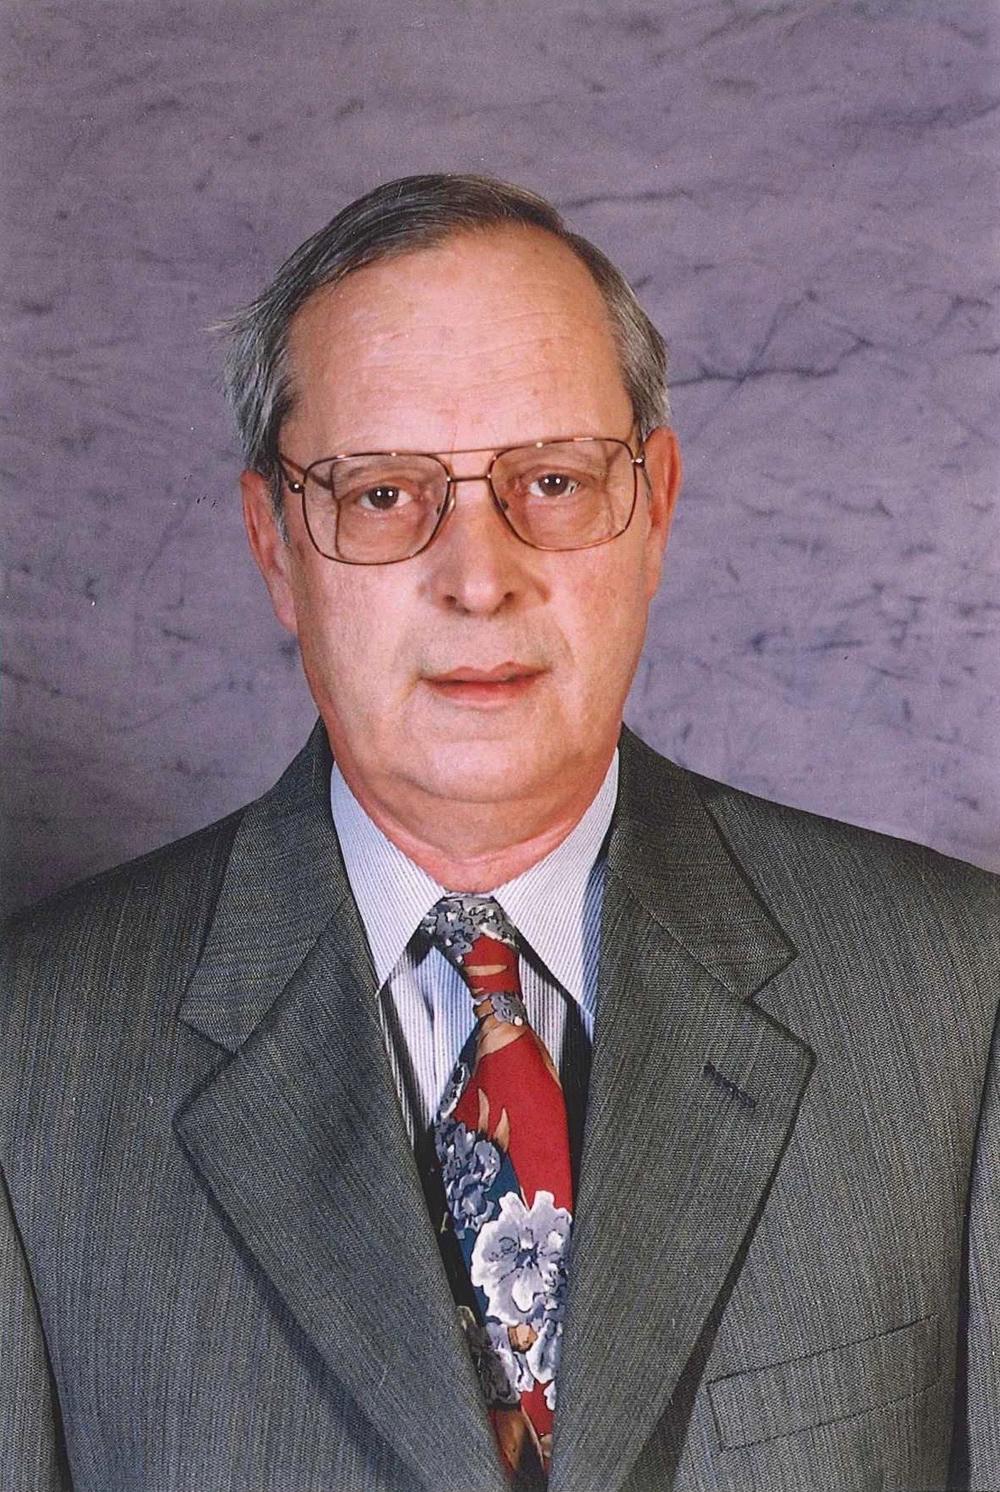 Tom Levasseur